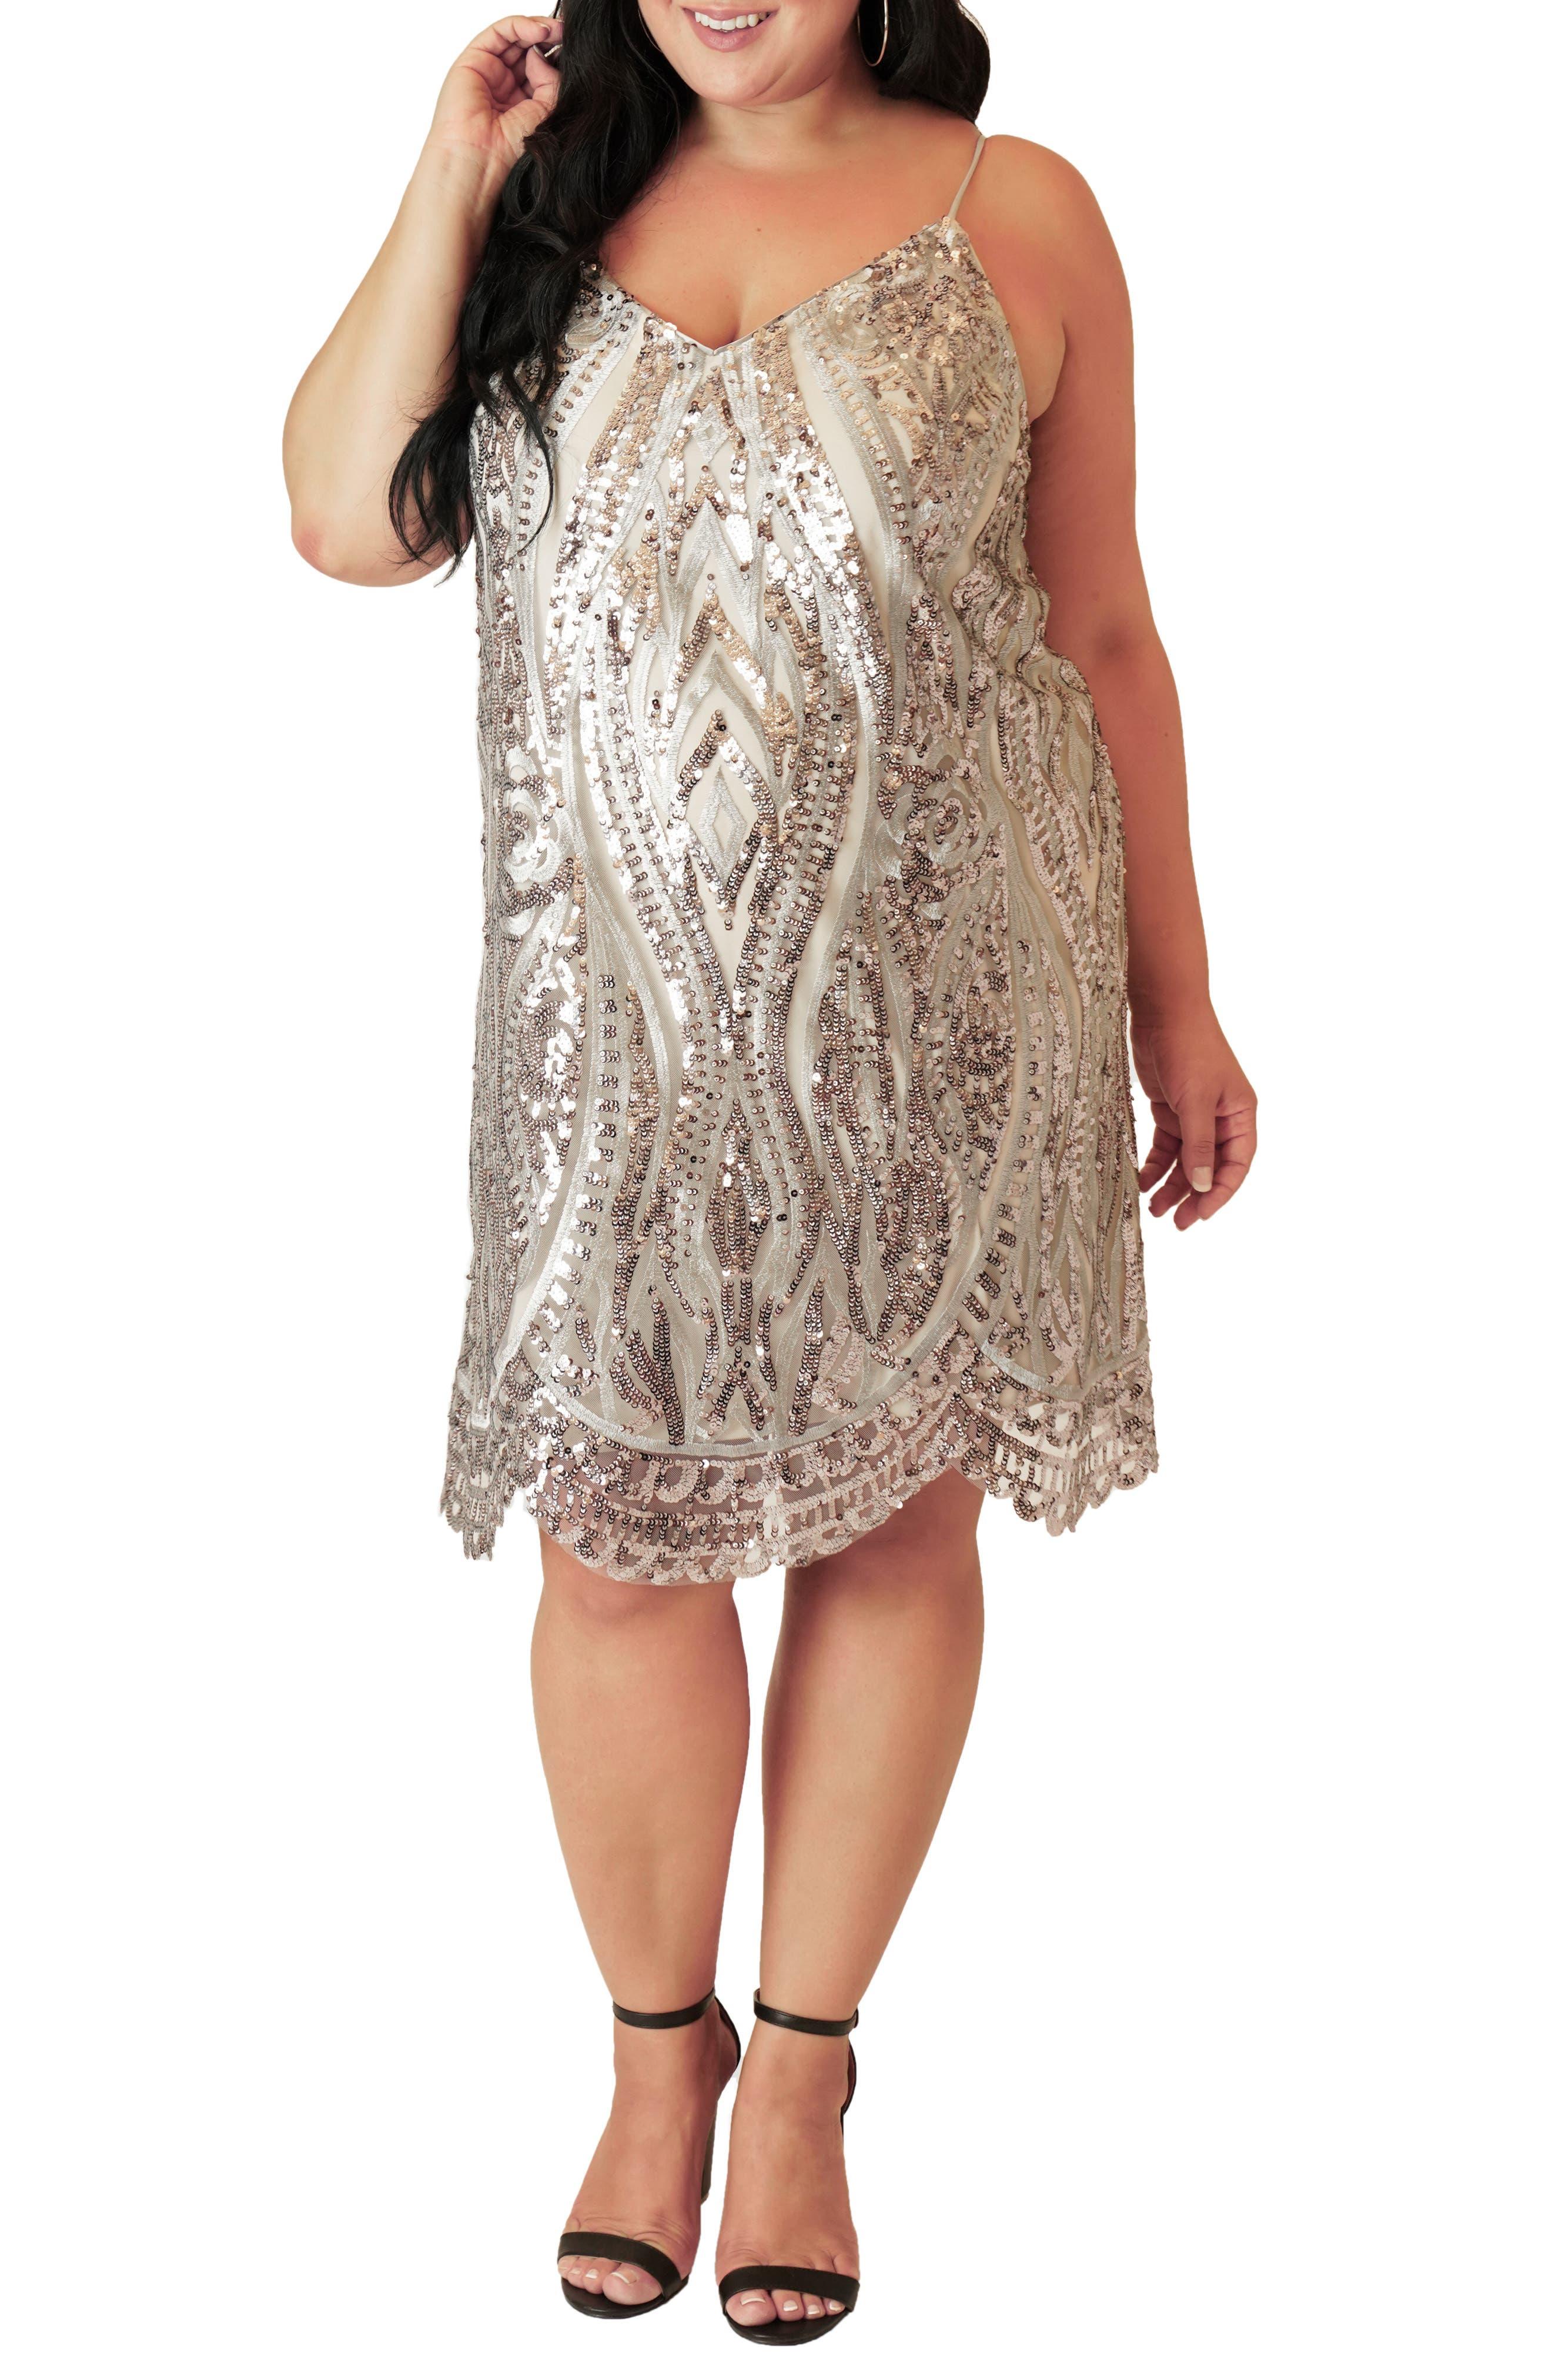 Vintage 1920s Dresses – Where to Buy Plus Size Womens Maree Pour Toi V-Neck Sequin Shift Dress $159.00 AT vintagedancer.com